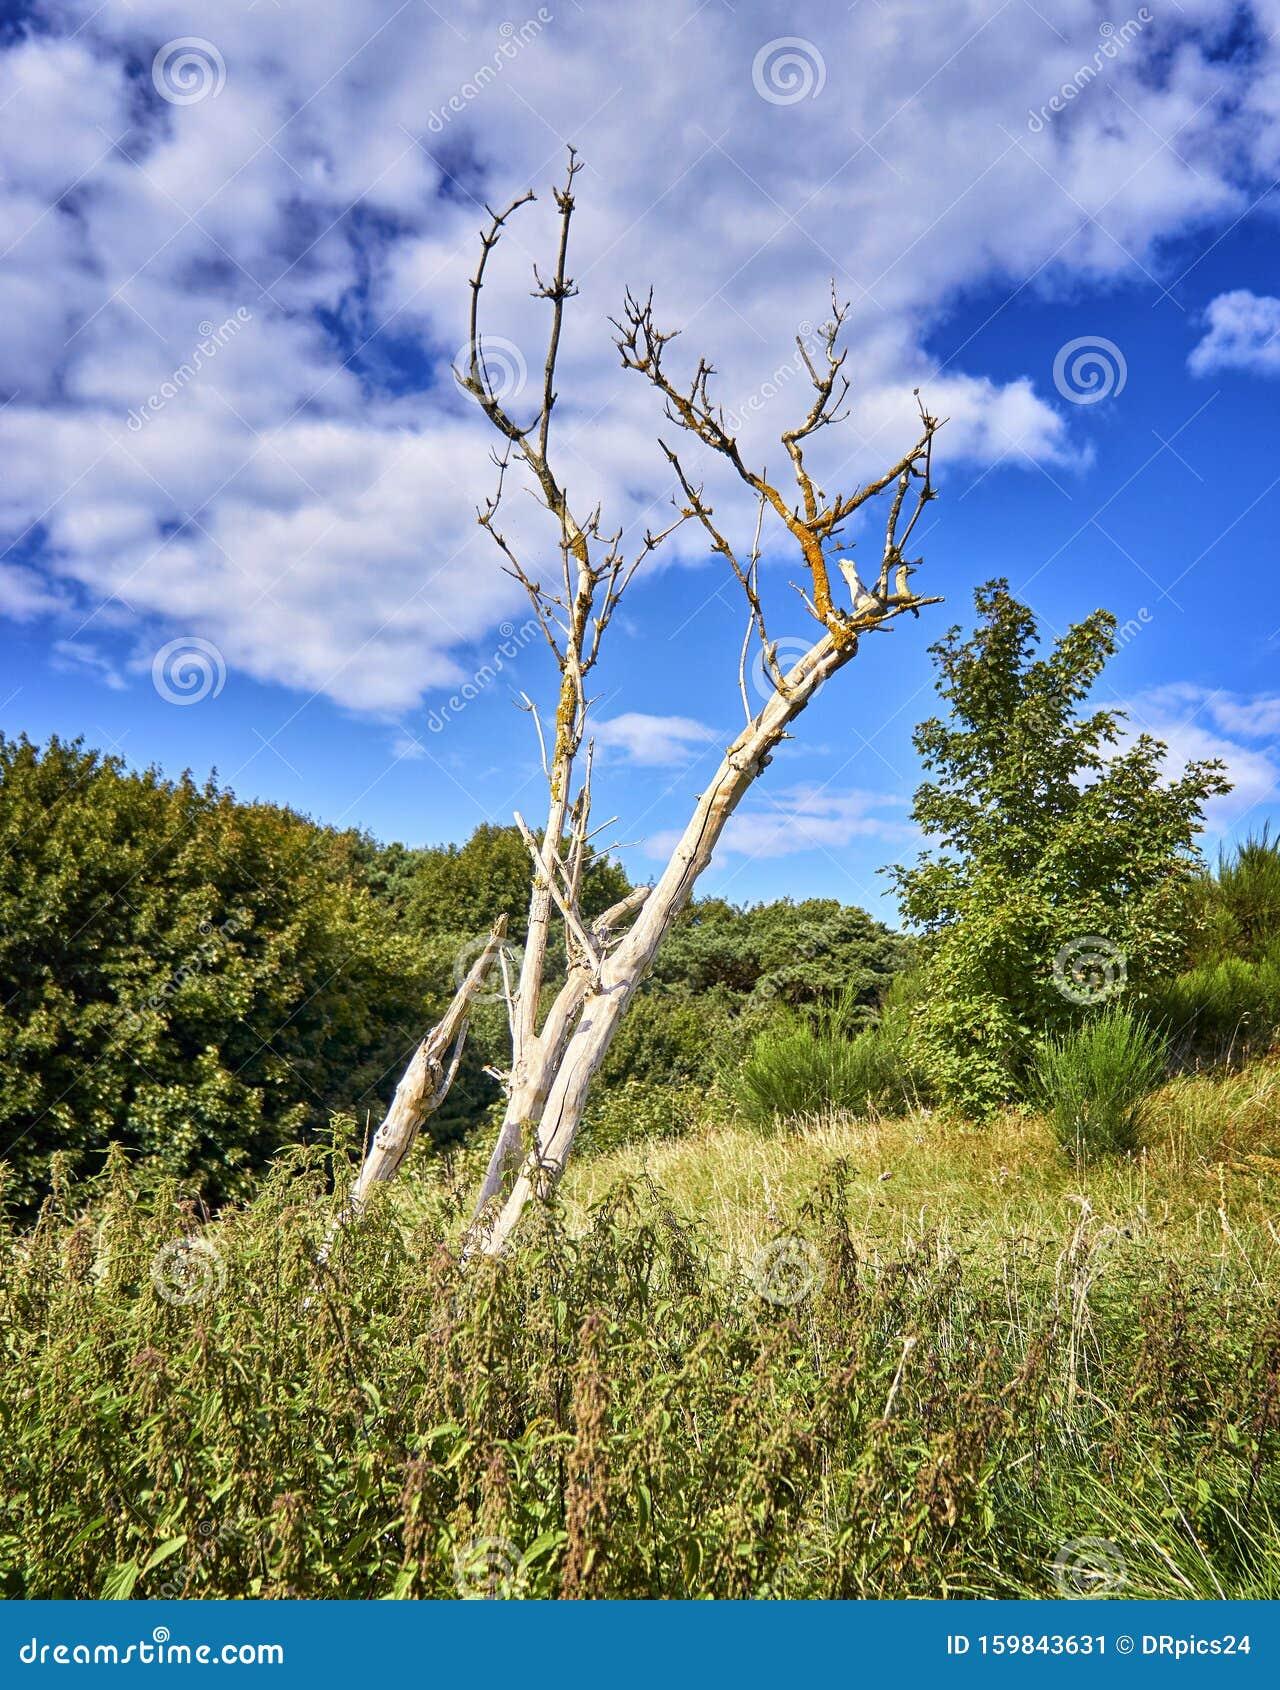 Naked Tree In A Field Of Wild Anemone (windflower) Flowers